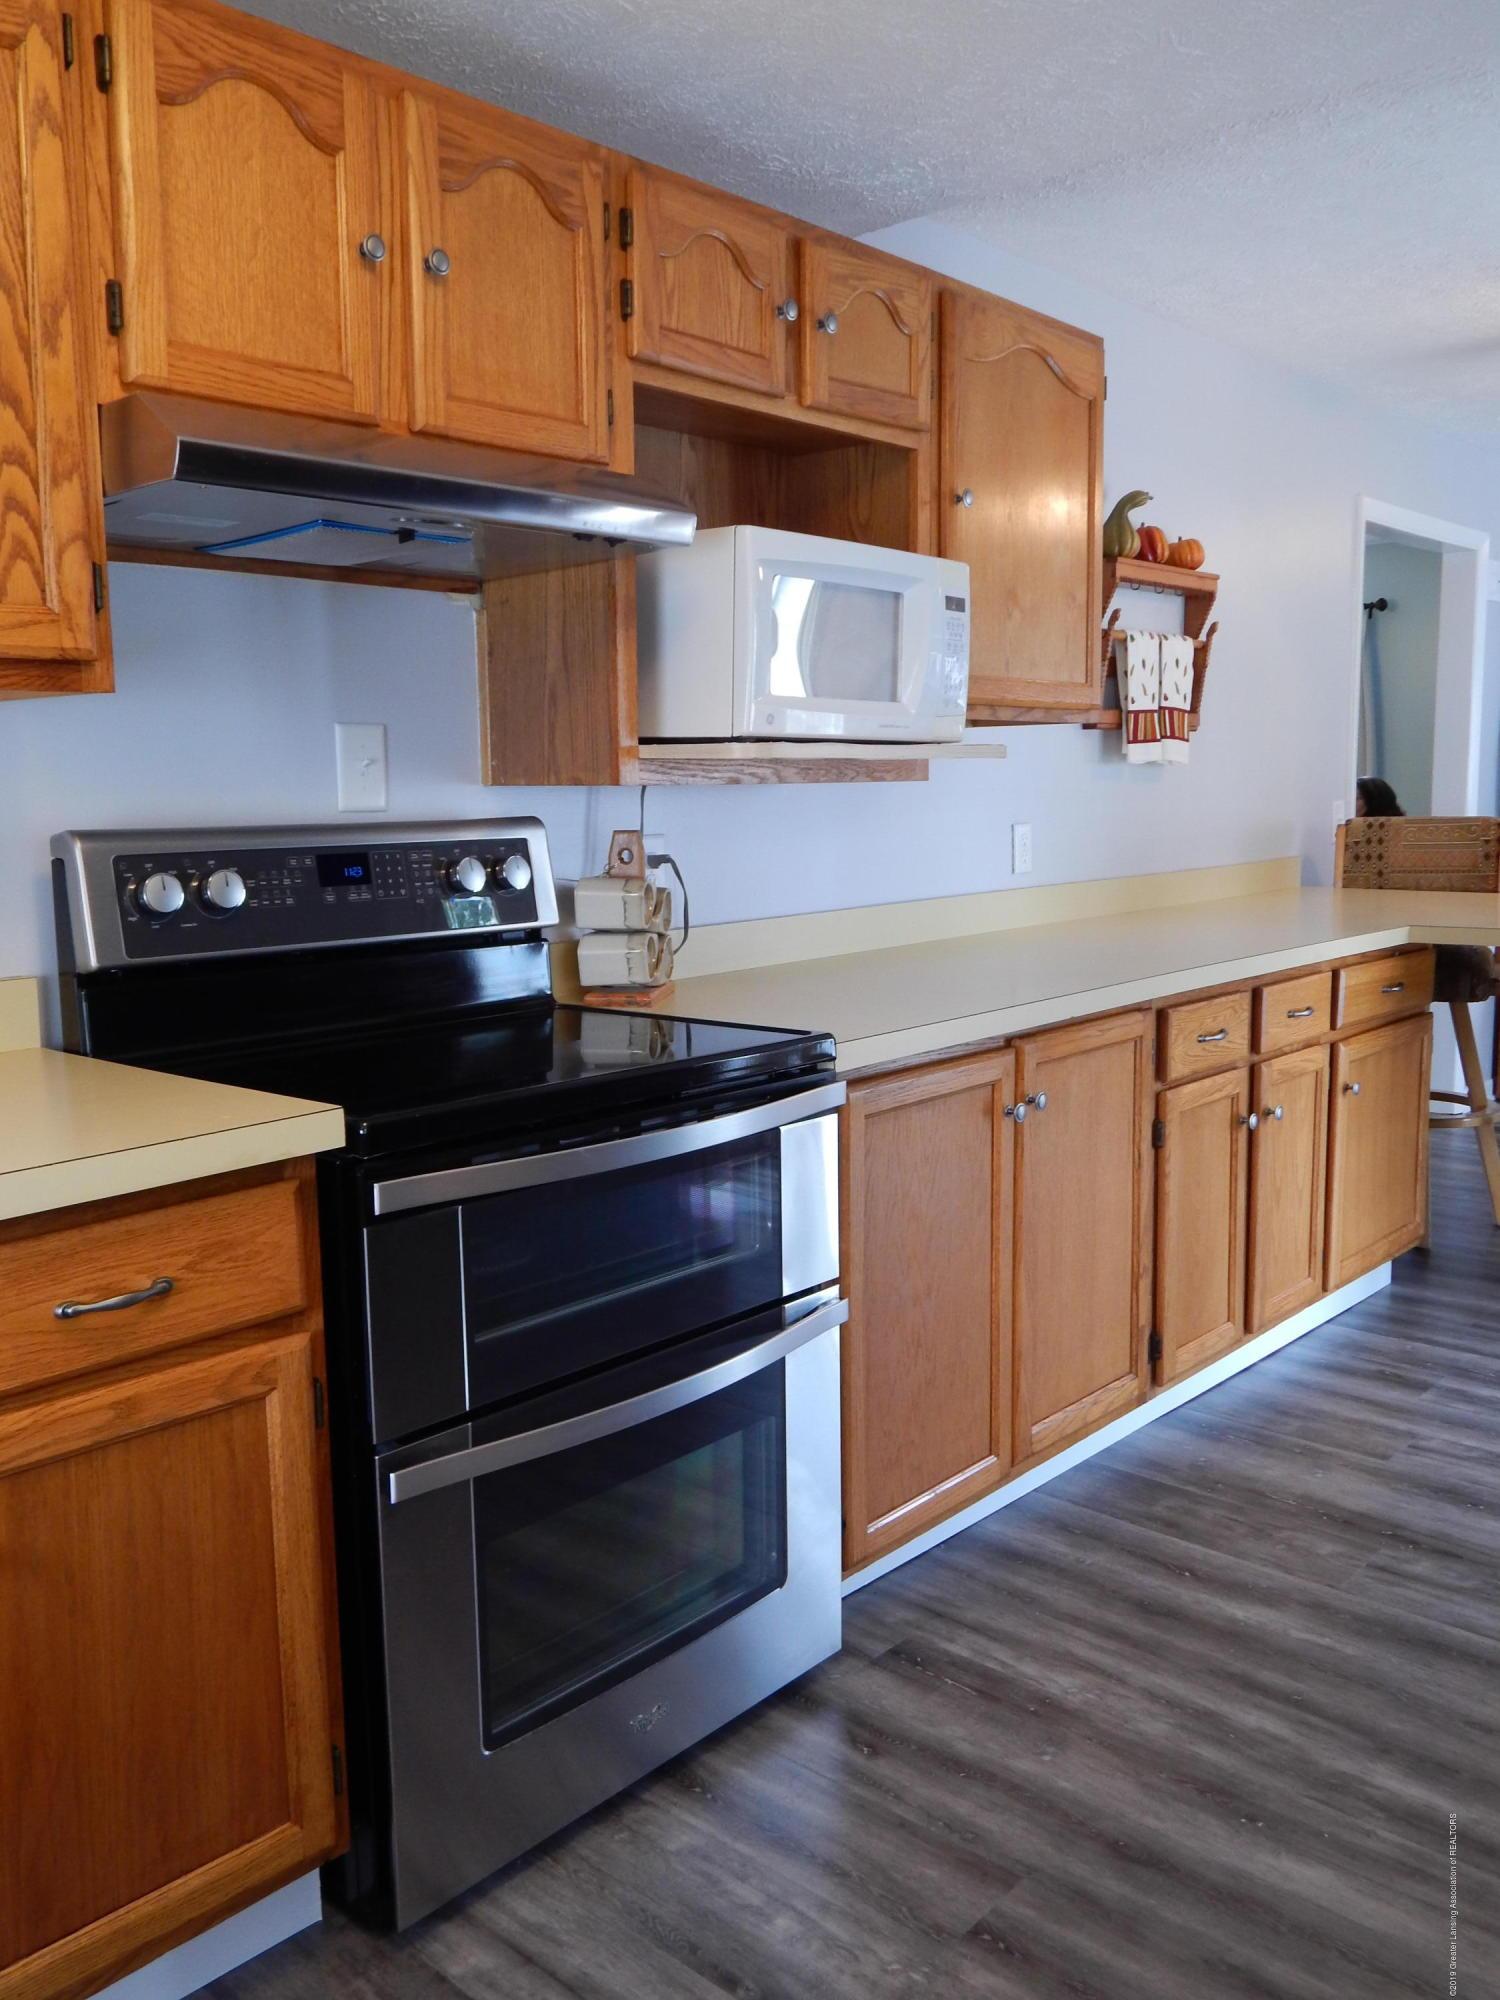 2605 Hazelwood Dr - Kitchen - 17